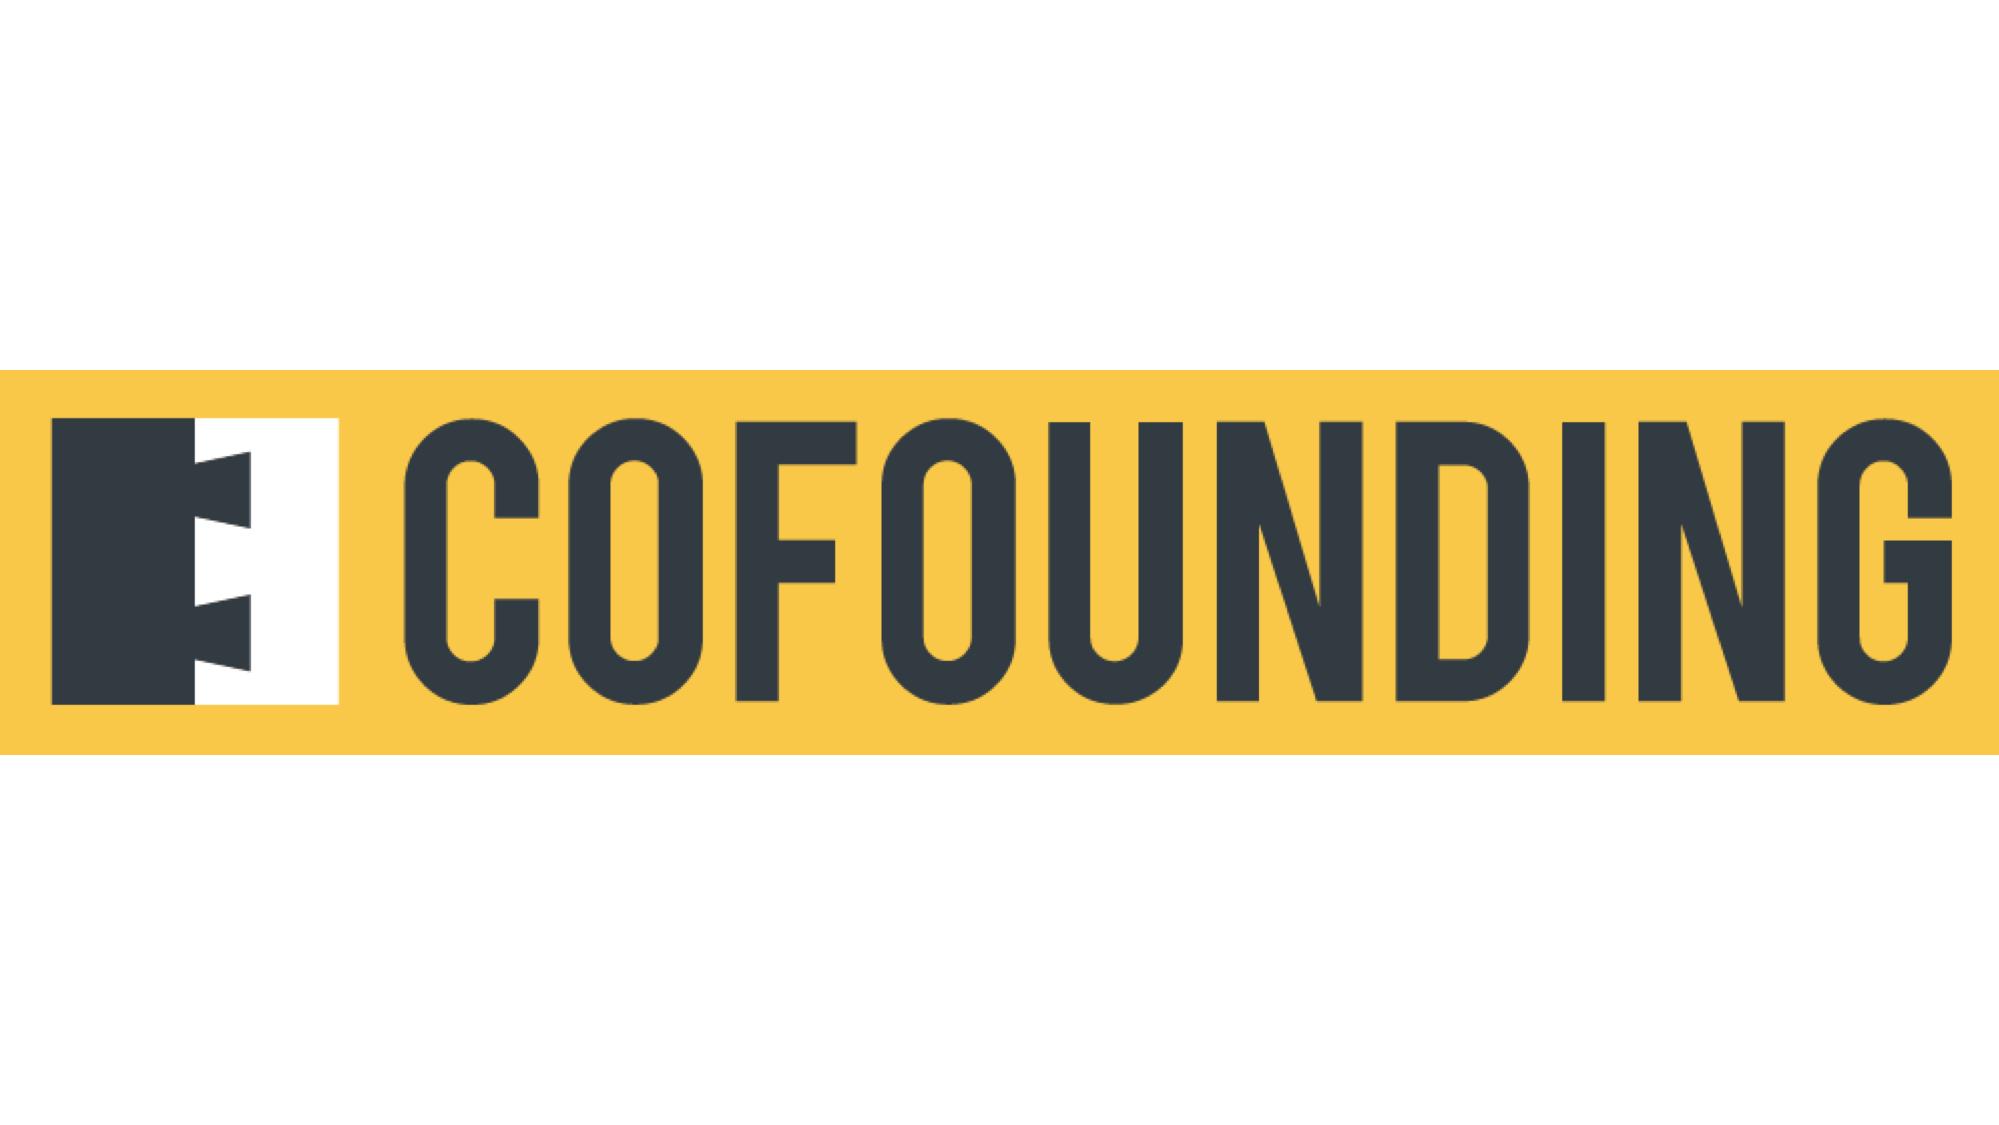 Co-Foundme